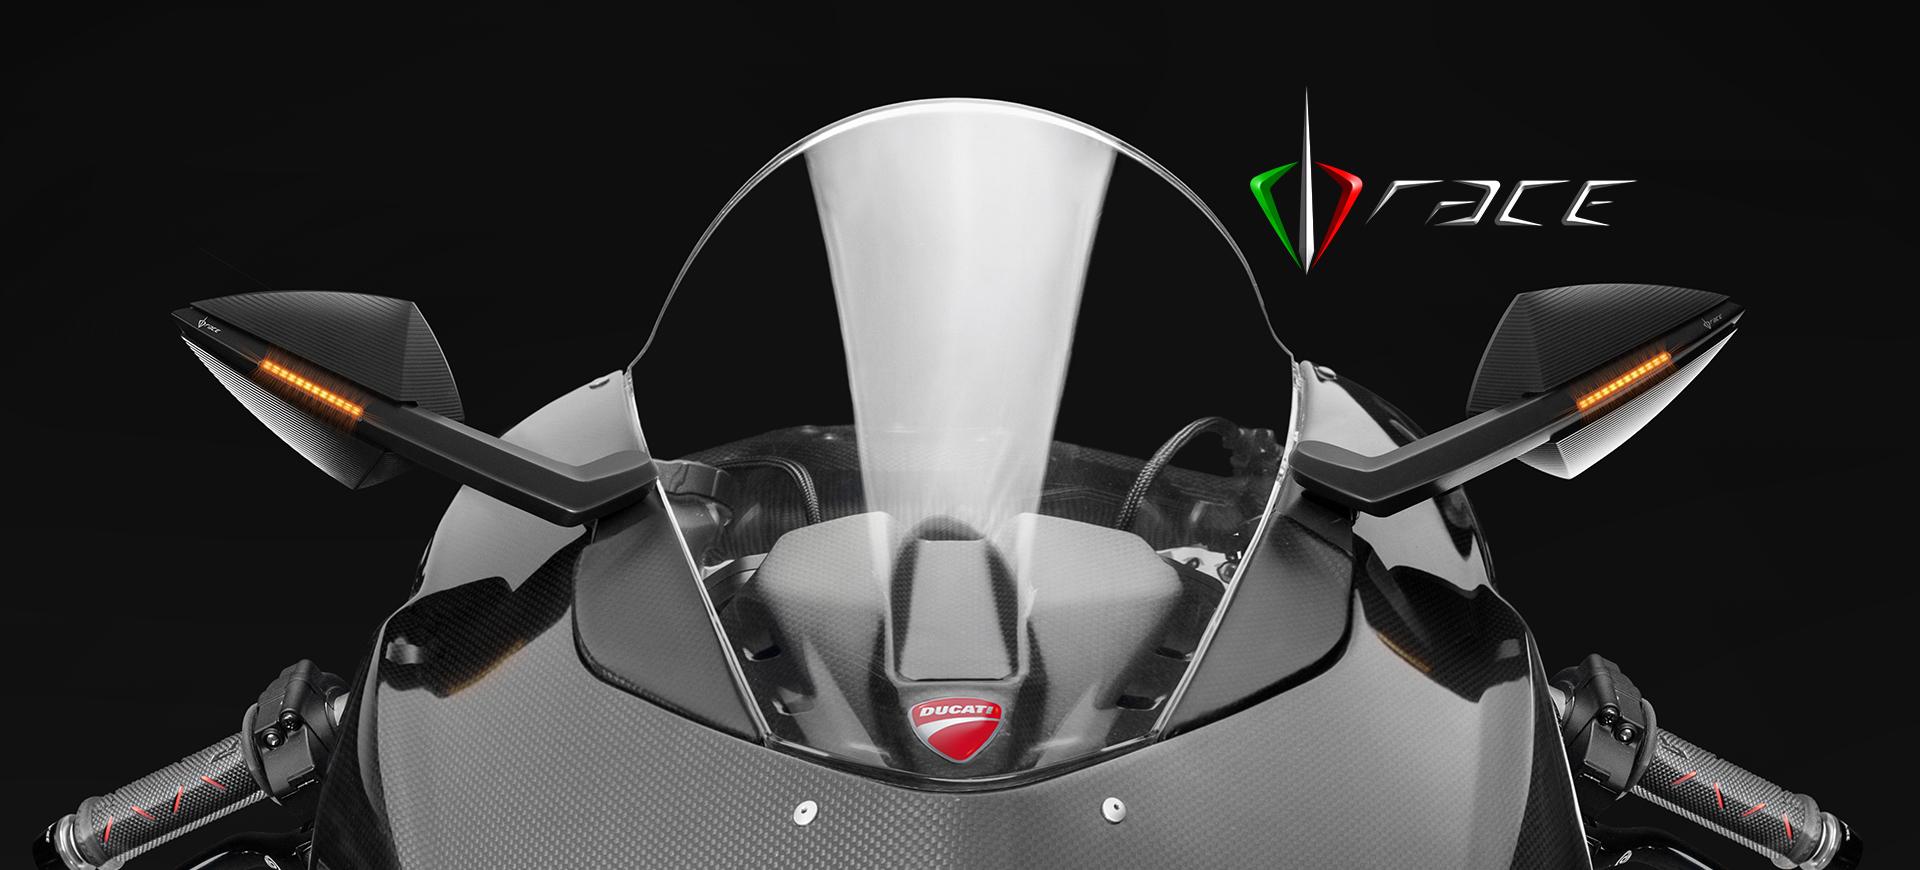 DB Race Mirrors & Accessories UK Dealer